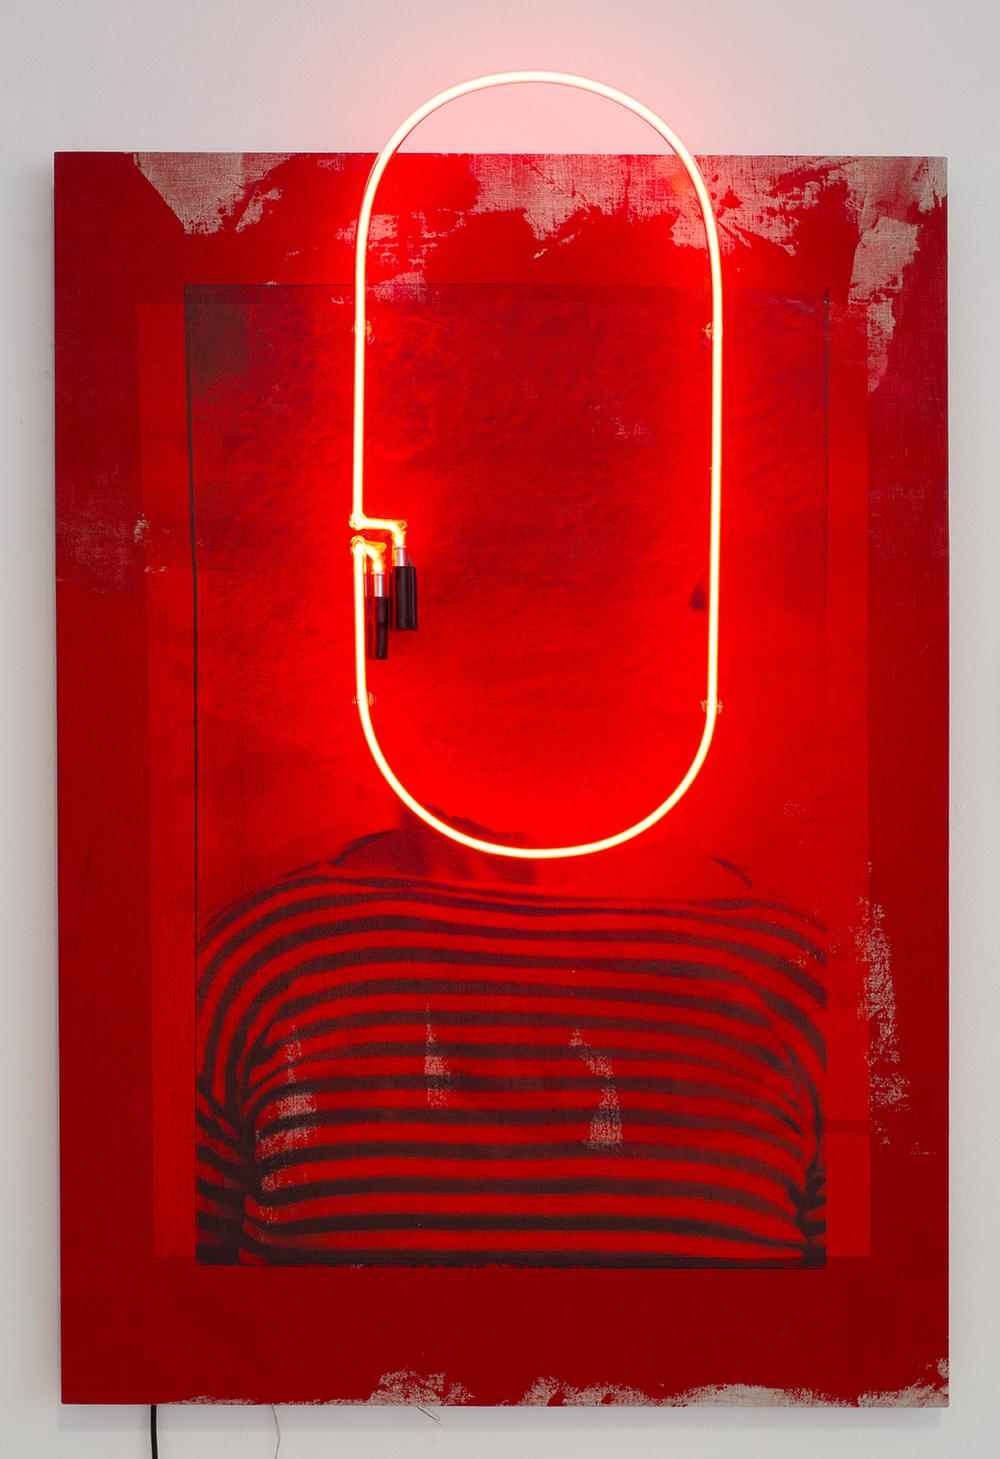 Stripes II,  2016  Linen, acrylic ink, foil, neon  120 x 85 x 10,4 cm